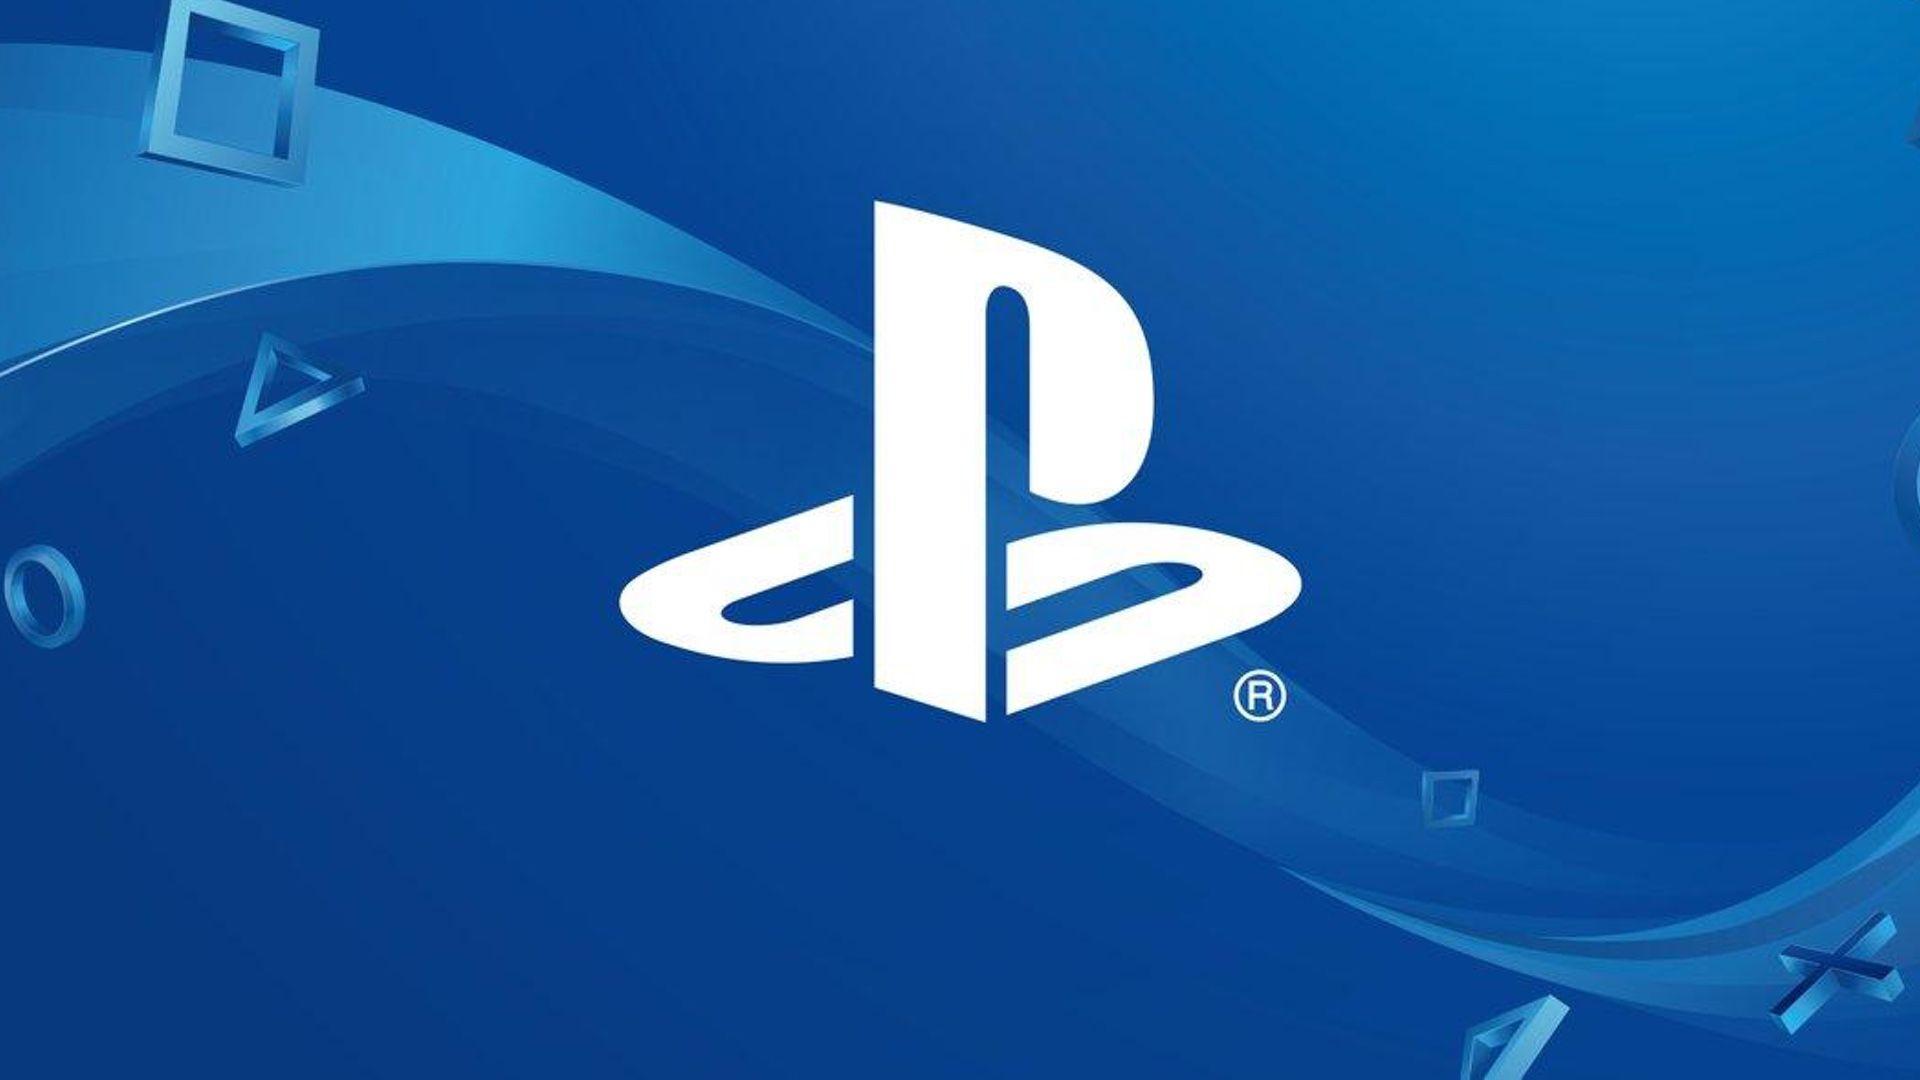 PlayStation Next-Gen PS5 E3 2020 Samsung NVMe SSD Sony Xbox Series X PAX East 2020 Coronavirus